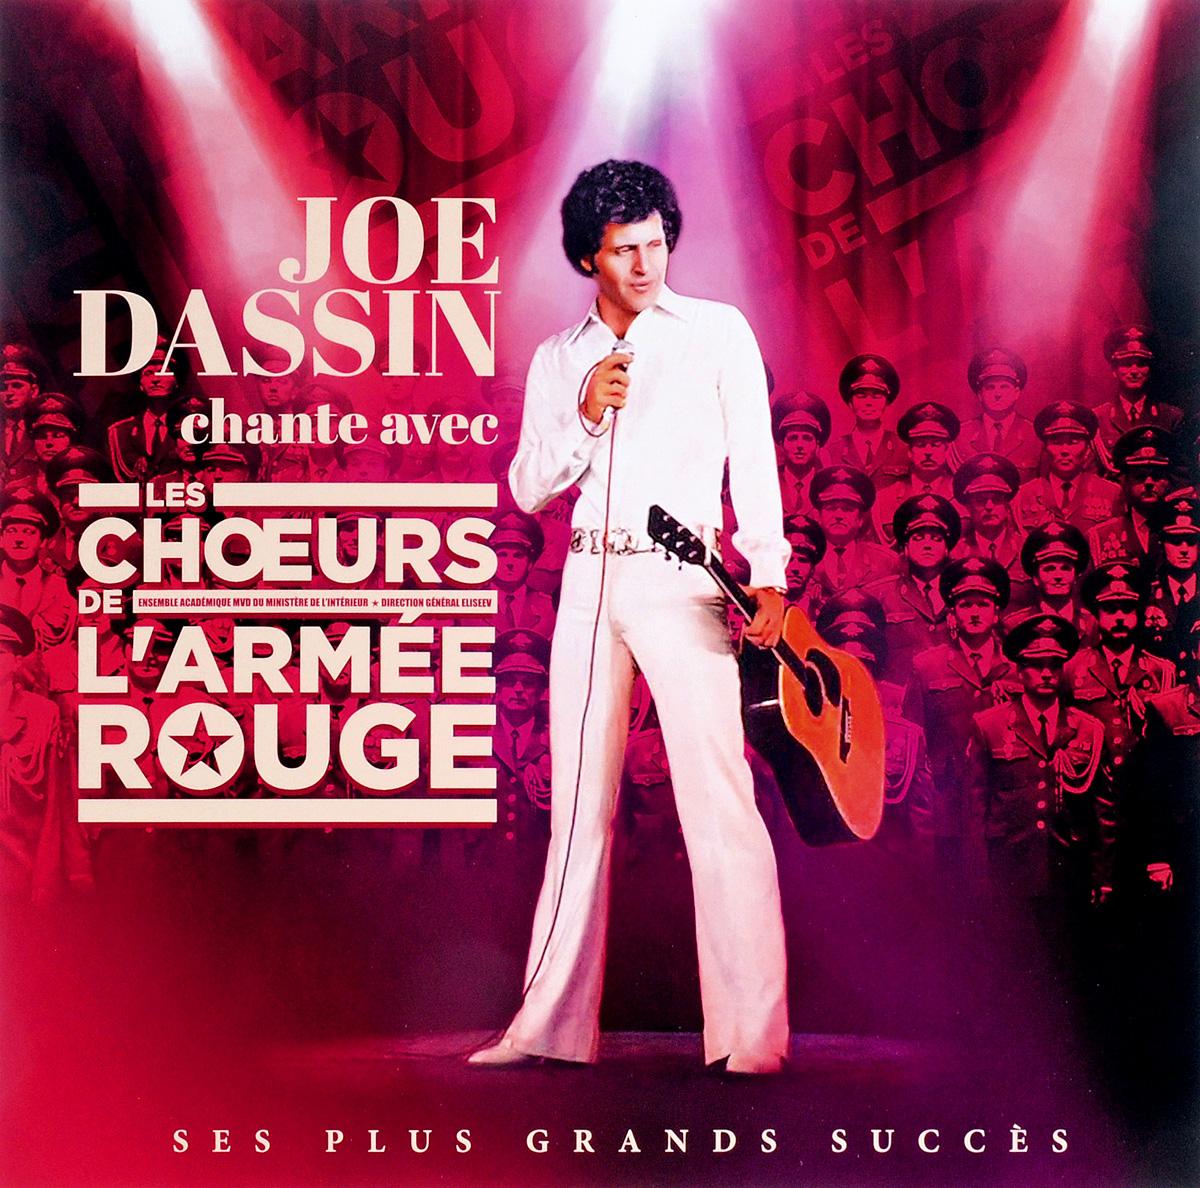 Джо Дассен Joe Dassin. Joe Dassin Chante Avec Les Choeurs De L'Armee Rouge (LP) joe dassin joe dassin joe dassin